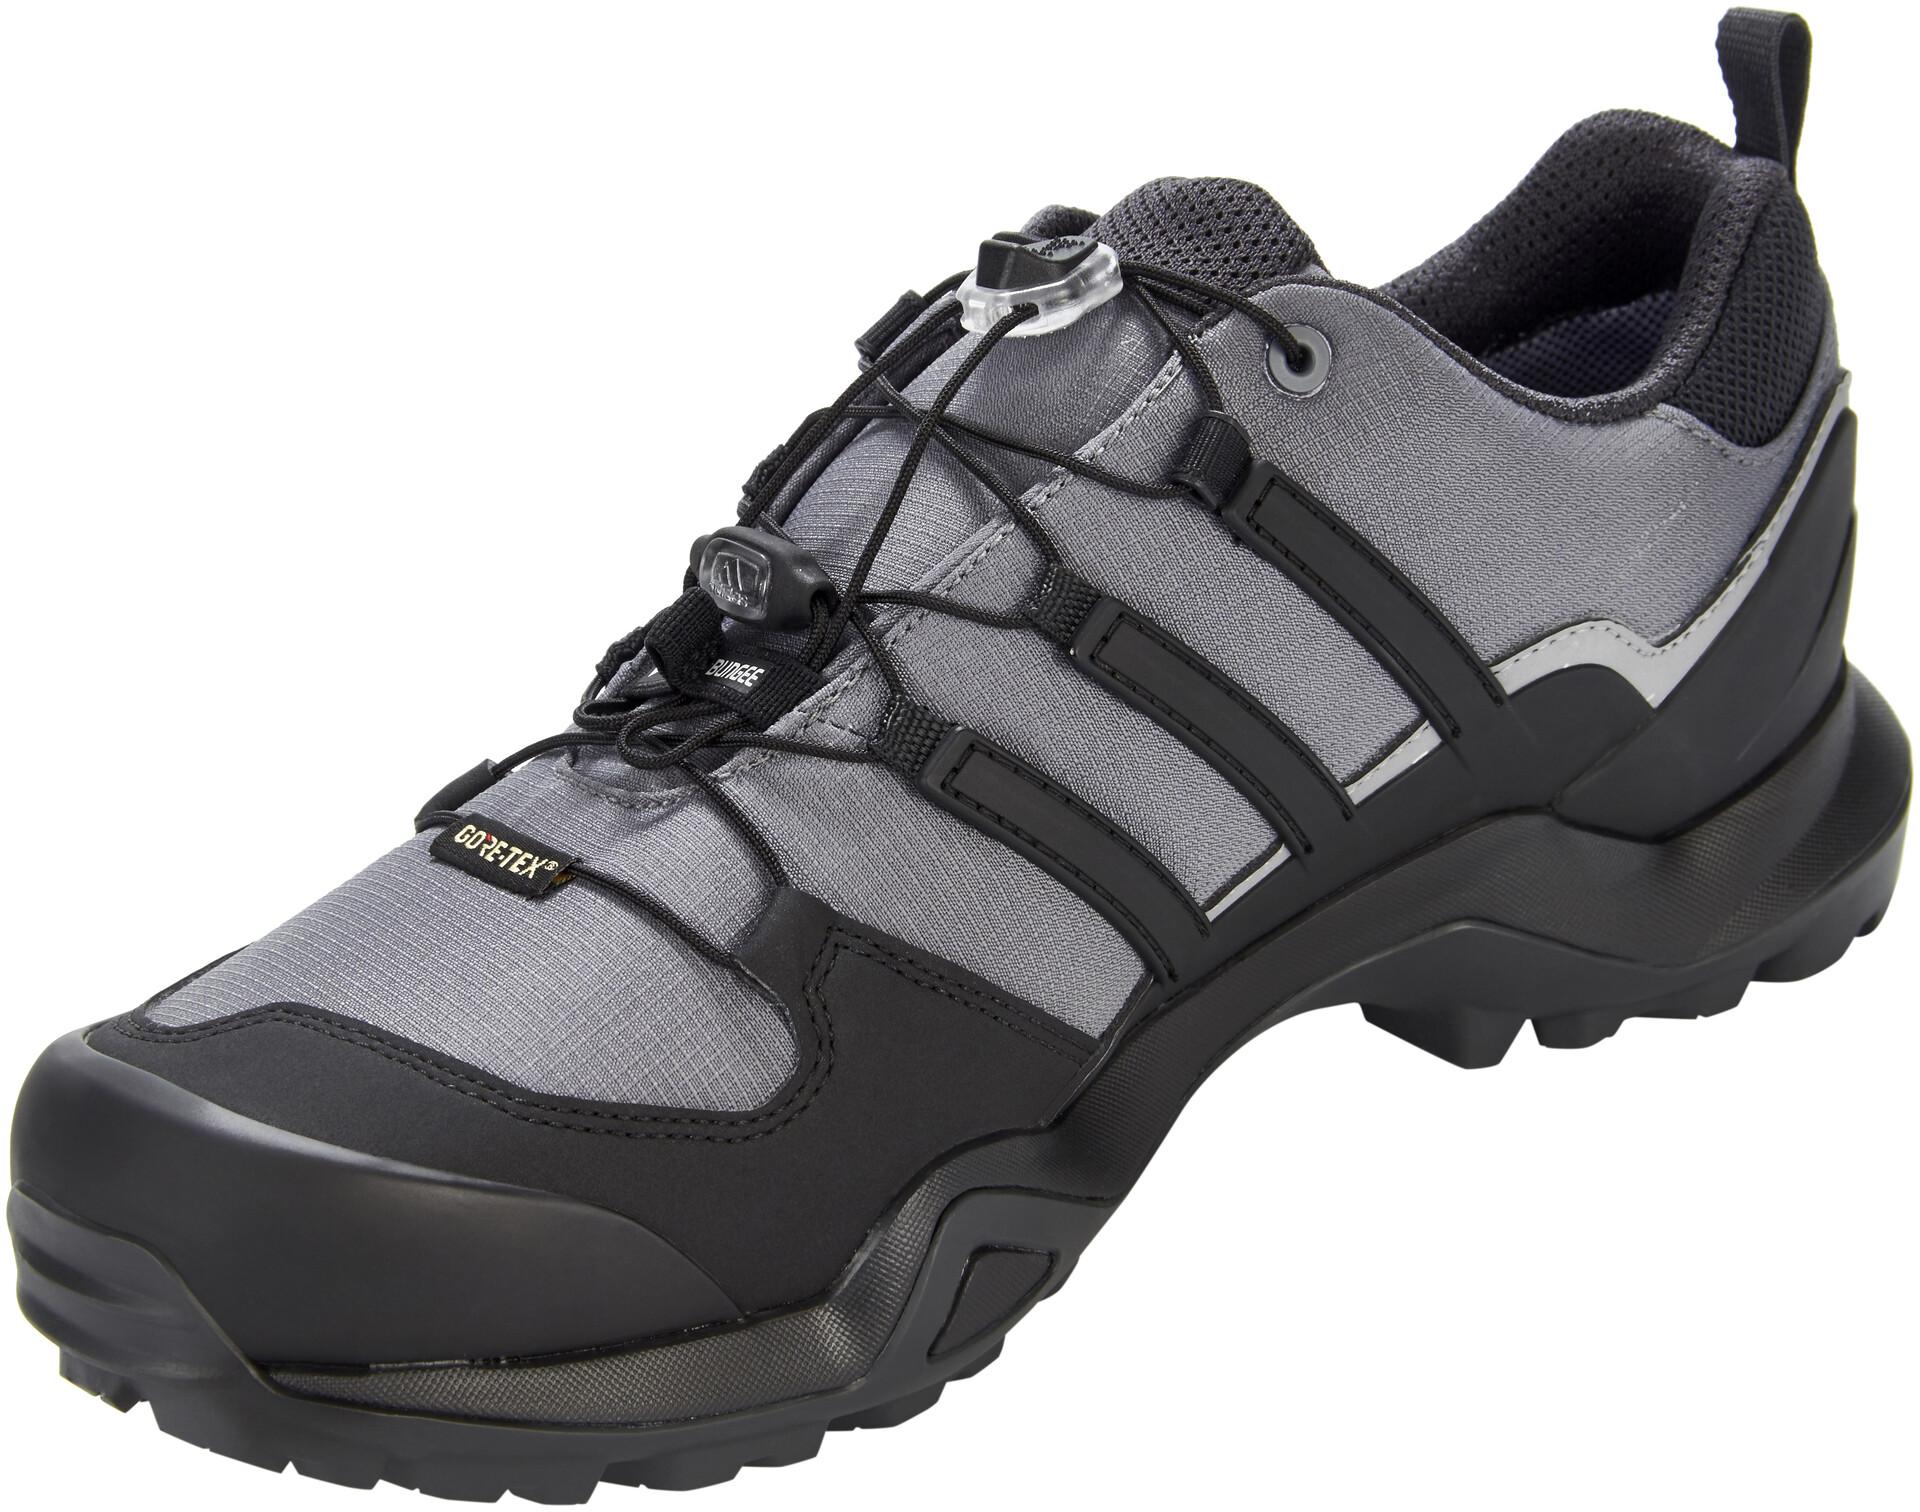 d60e442dc6a22b Gris Campz Gtx R2 Swift Chaussures Sur Adidas Homme Terrex gYHxRq8wZ